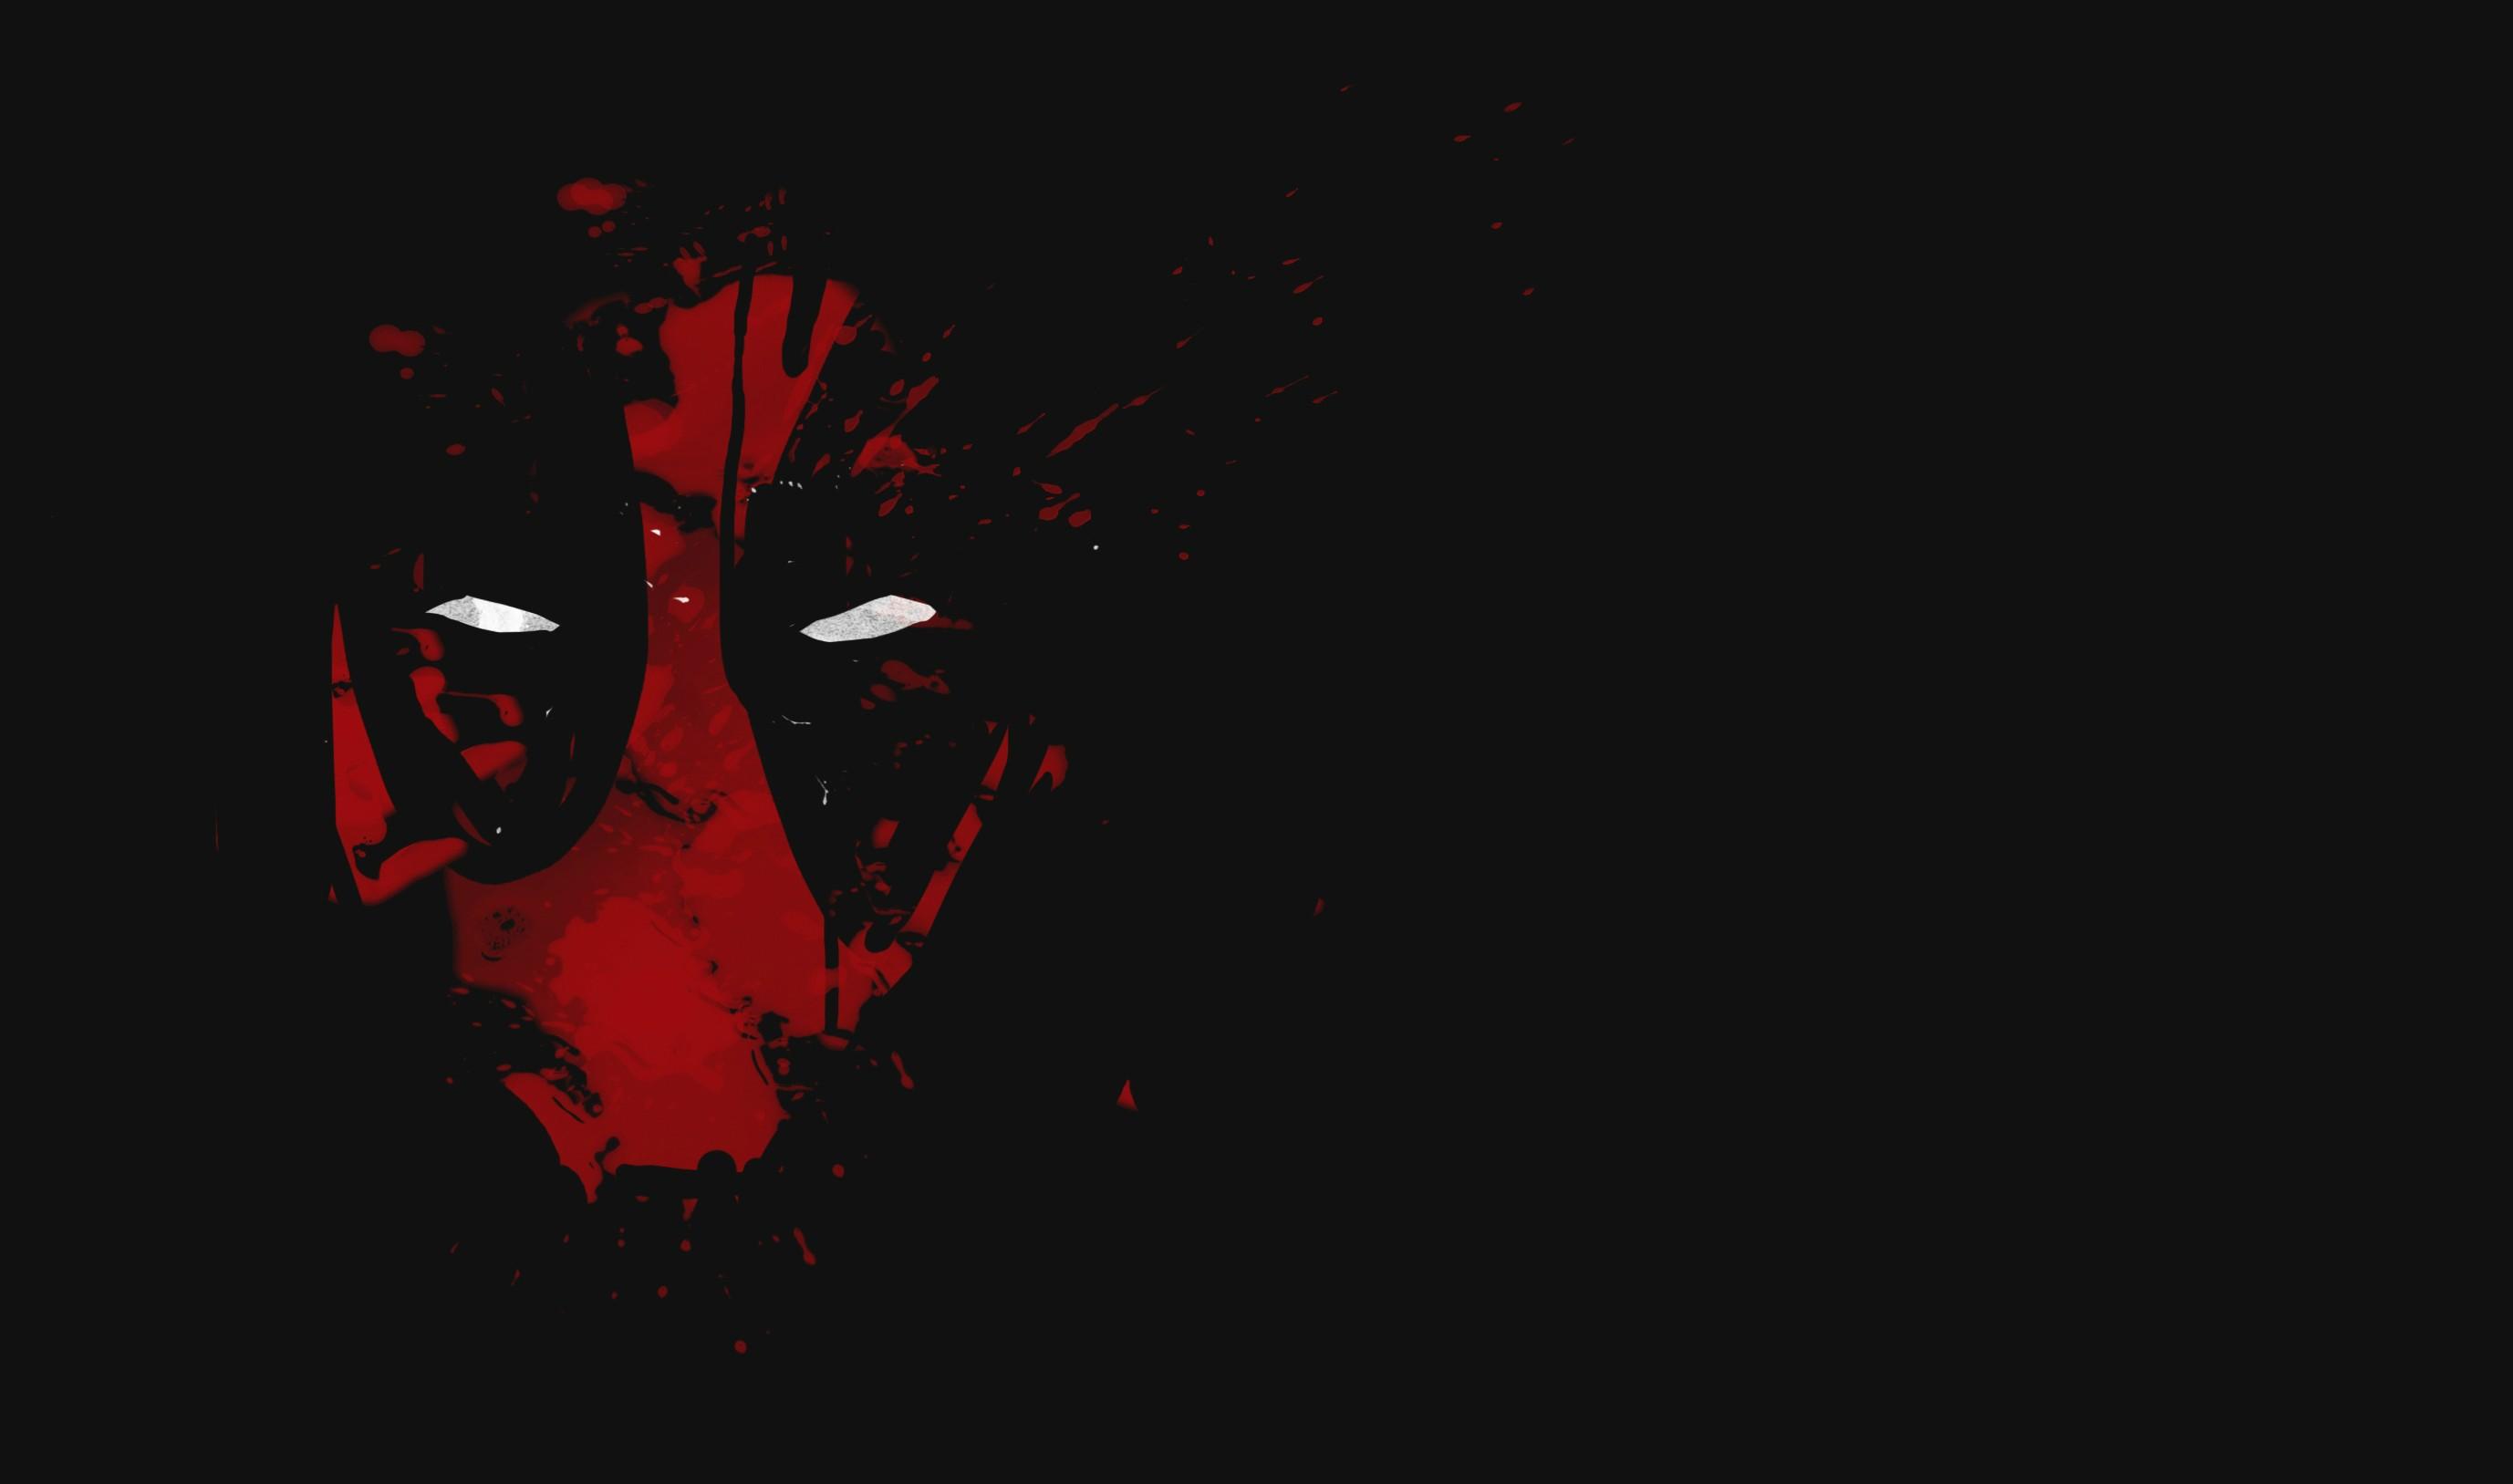 Deadpool movie HD Wallpapers download 2755x1627